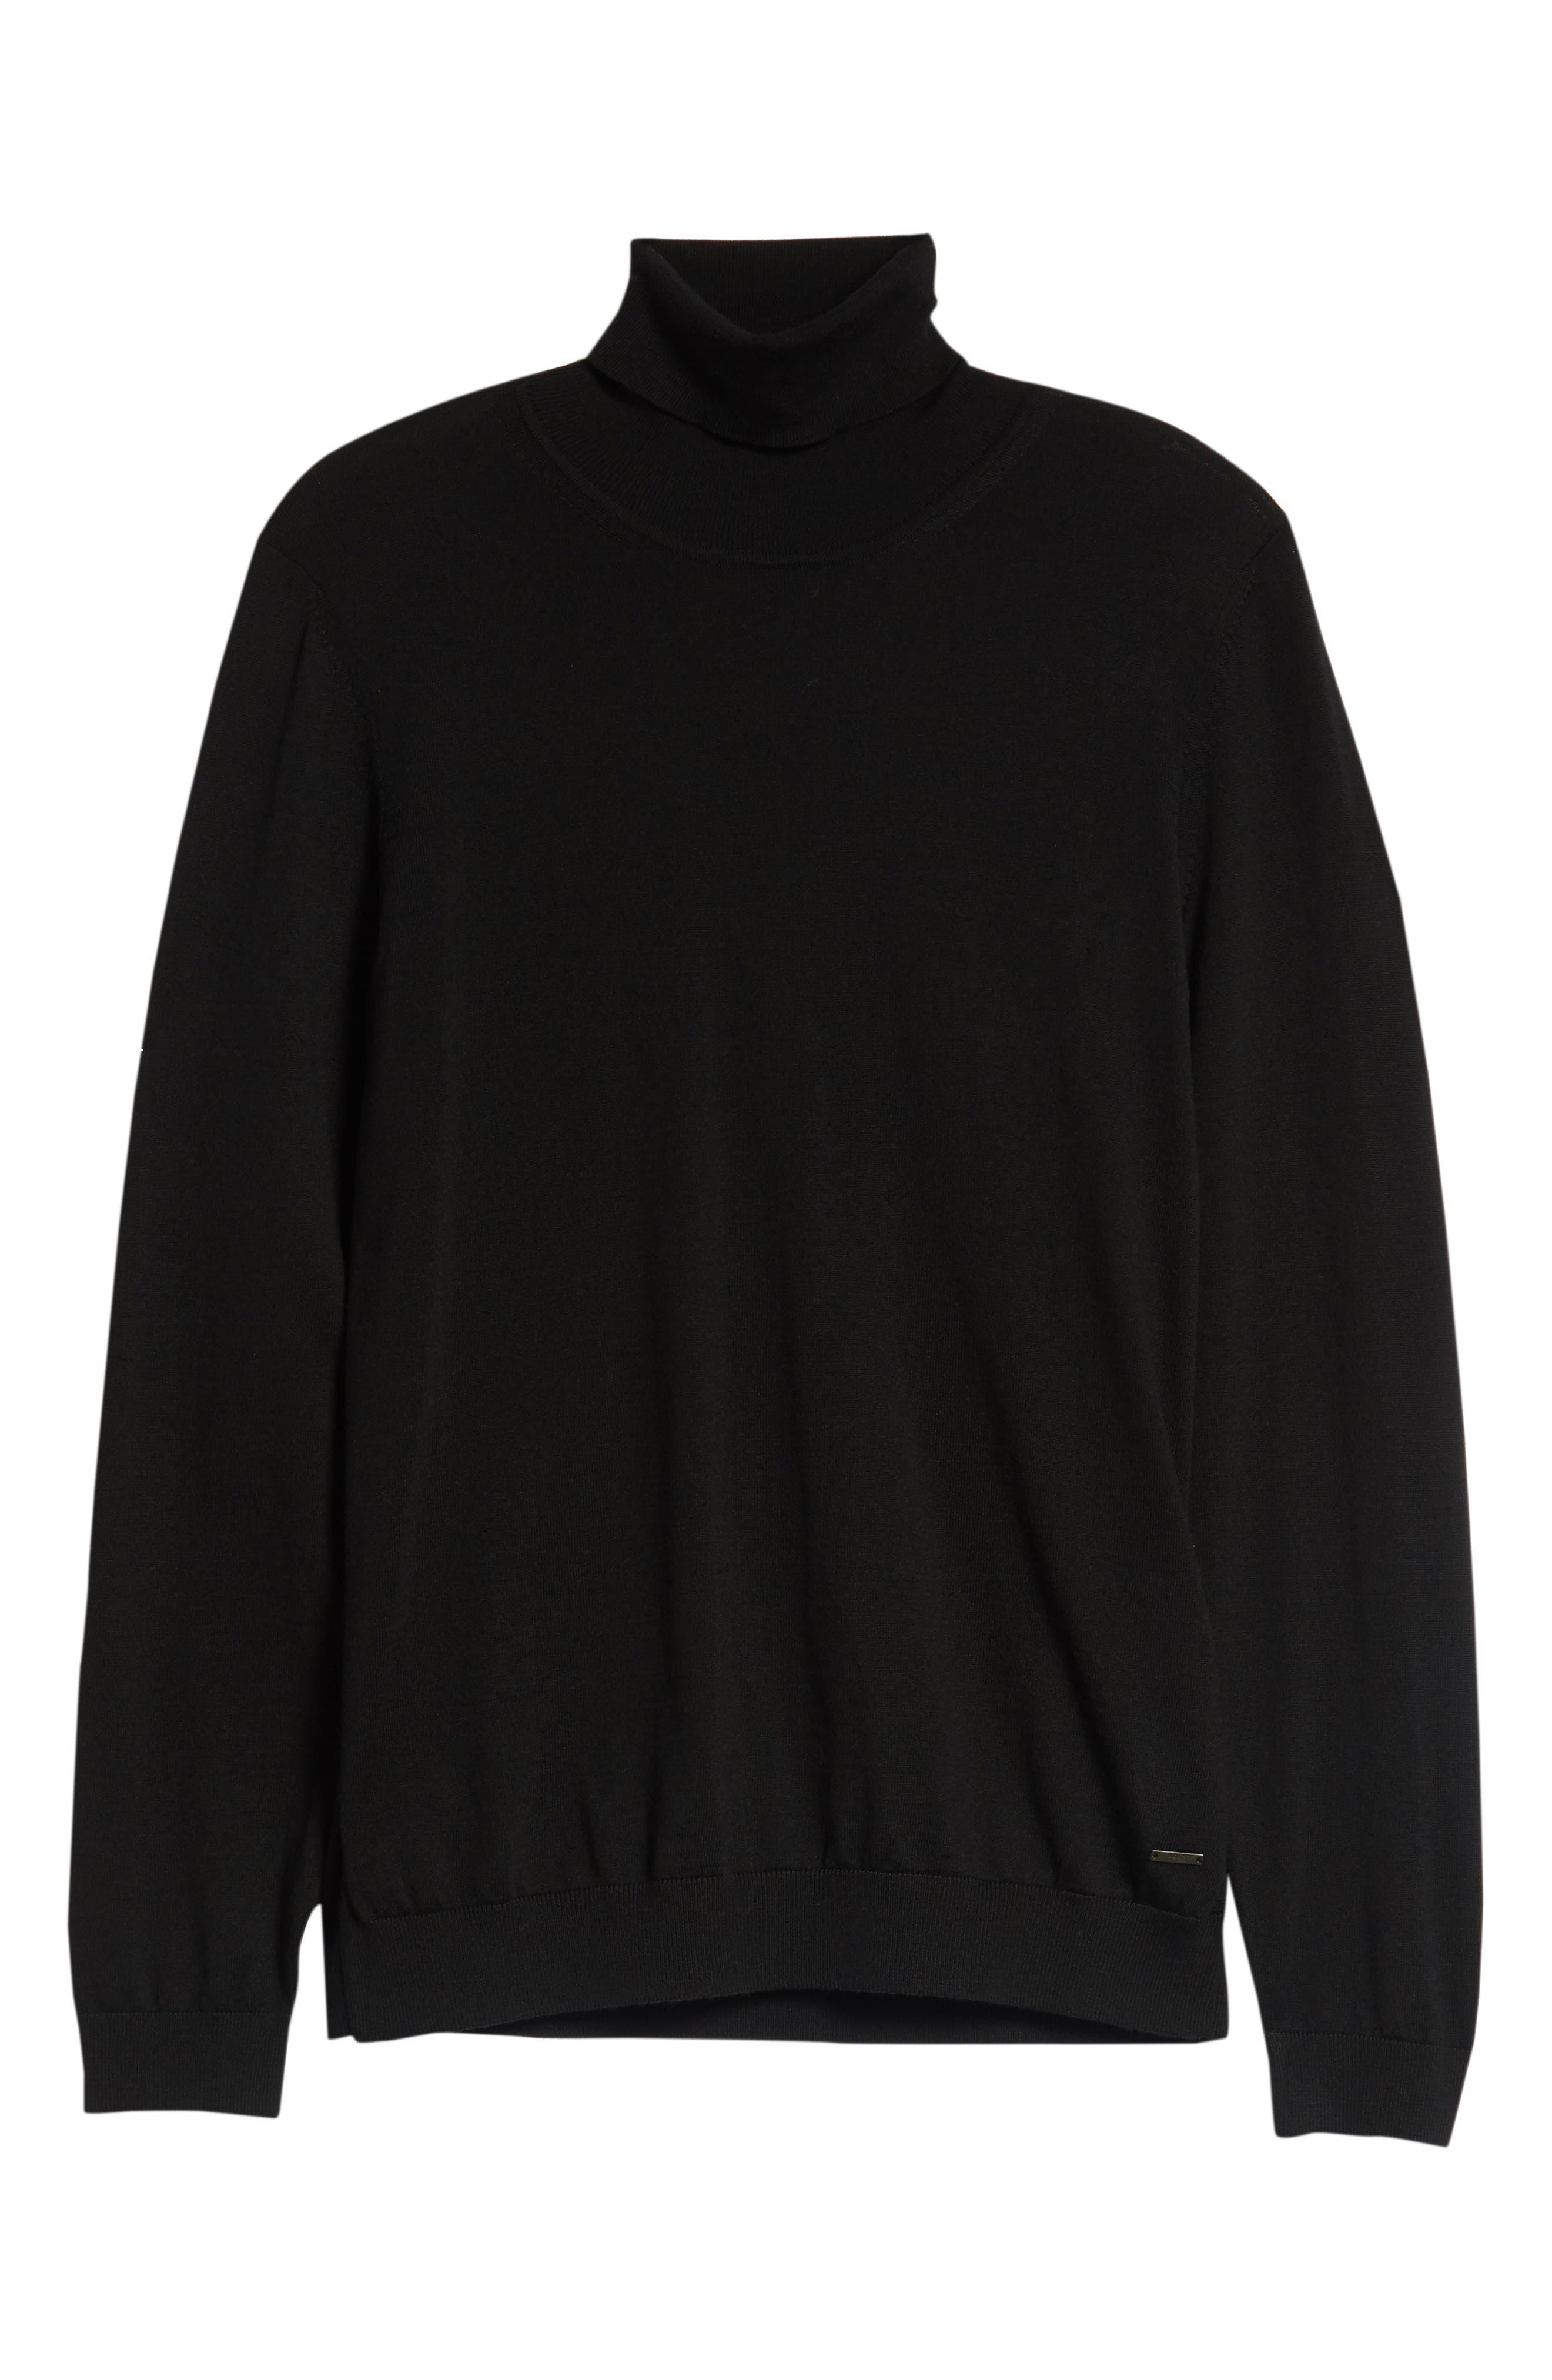 Musso Slim Fit Wool Turtleneck Sweater,                             Alternate thumbnail 6, color,                             BLACK